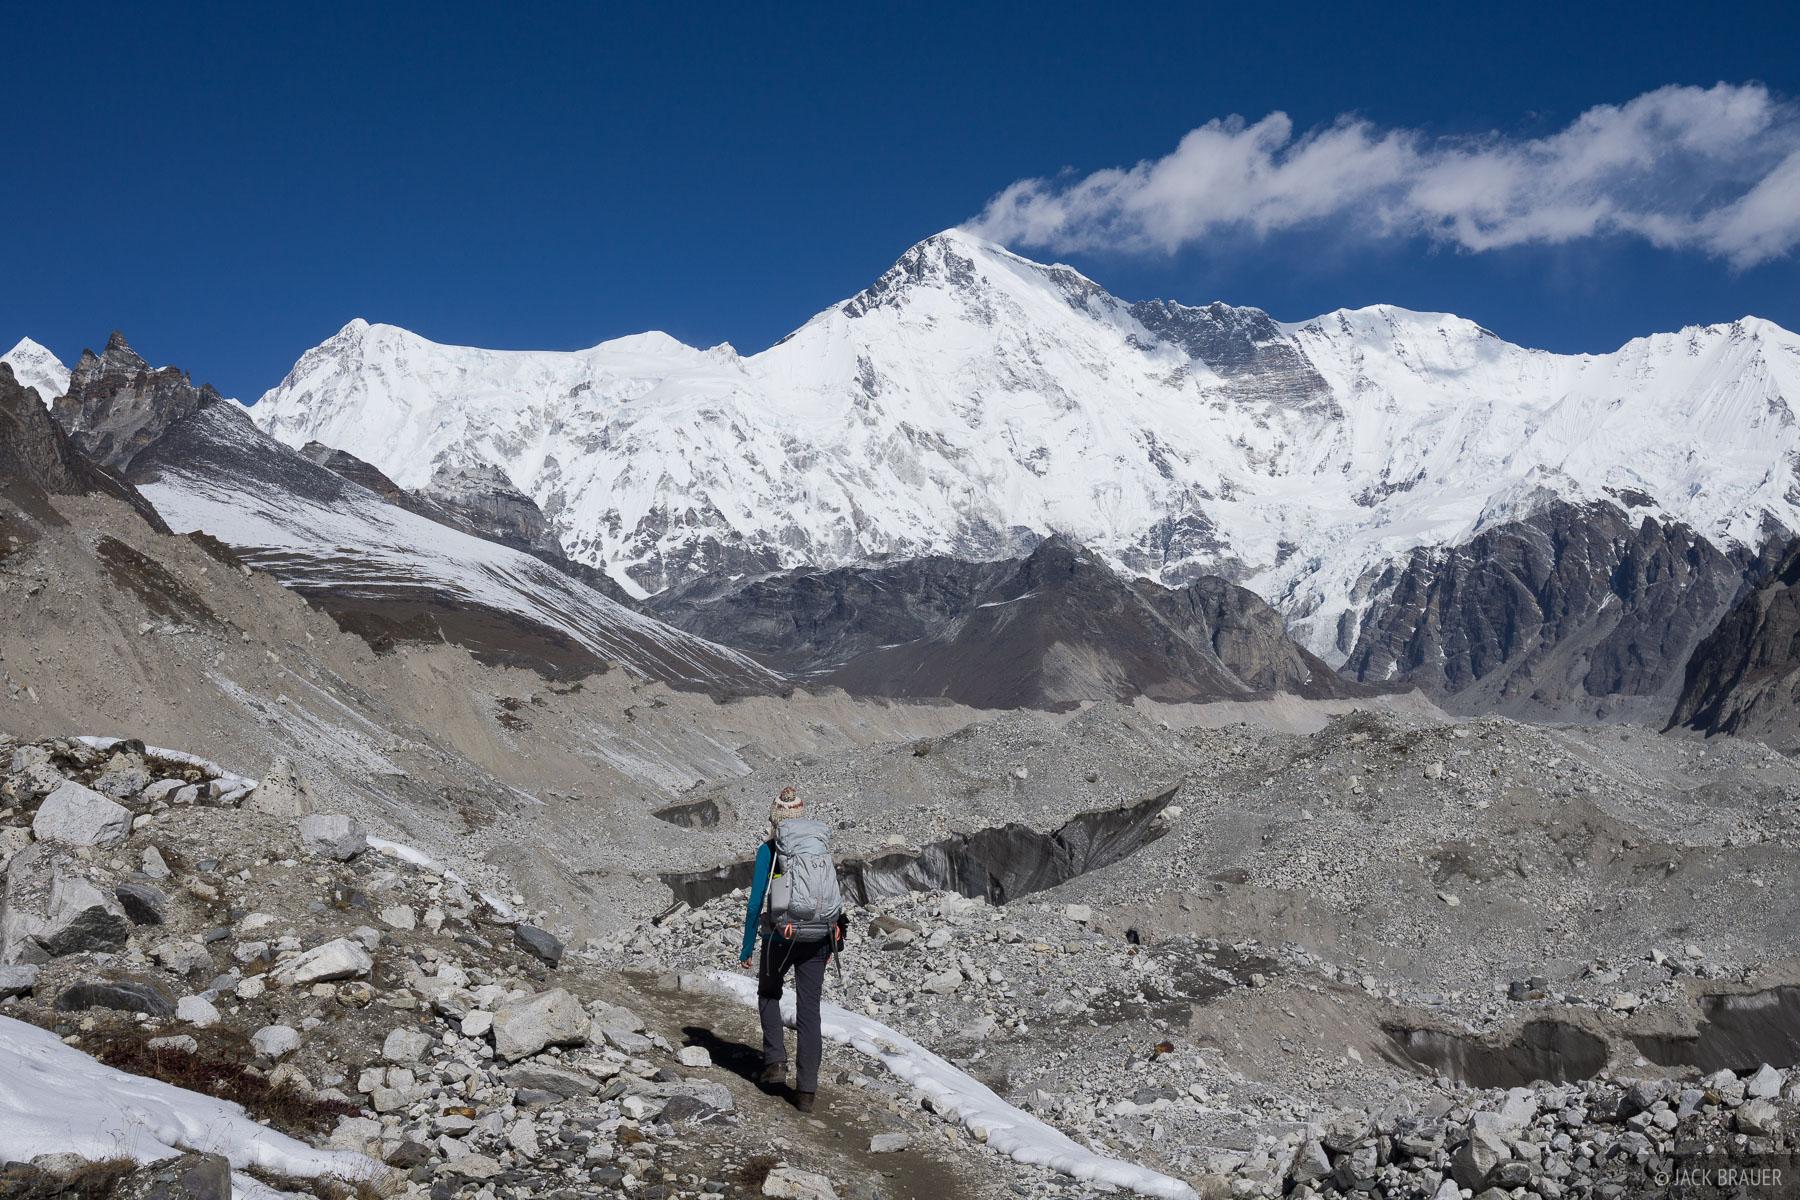 Himalaya,Khumbu,Nepal,Ngozumba Glacier, Cho Oyu, hiking, photo